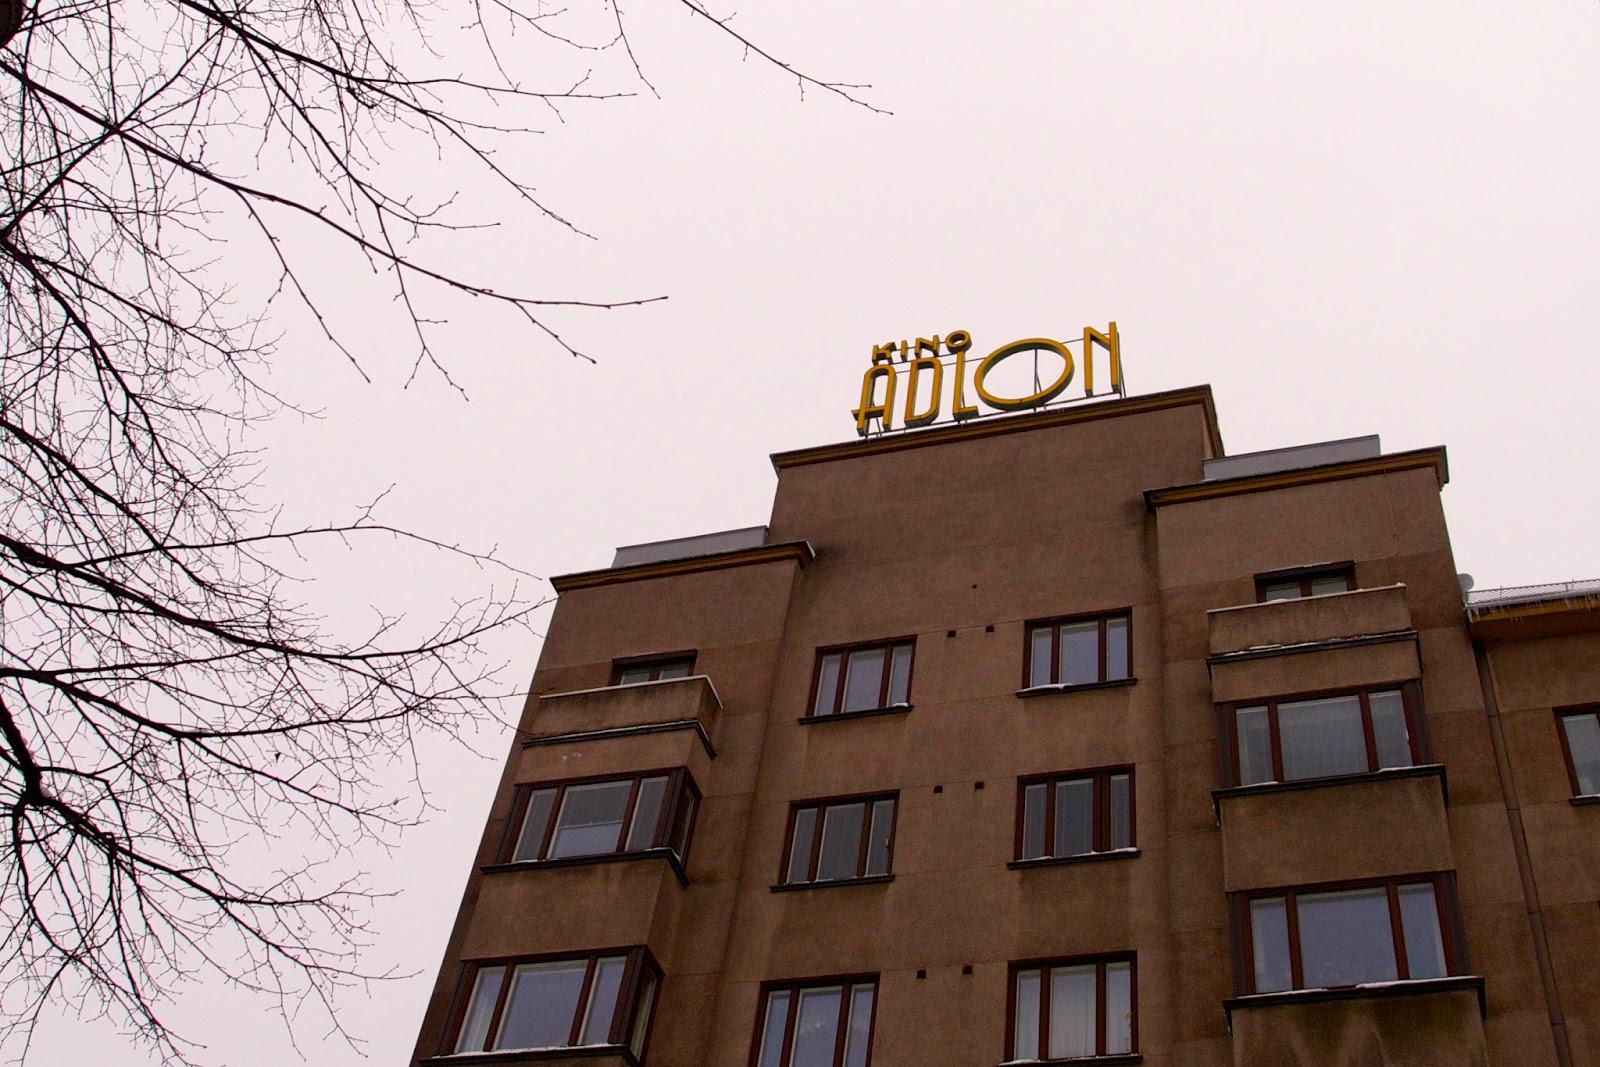 Adlon Helsinki